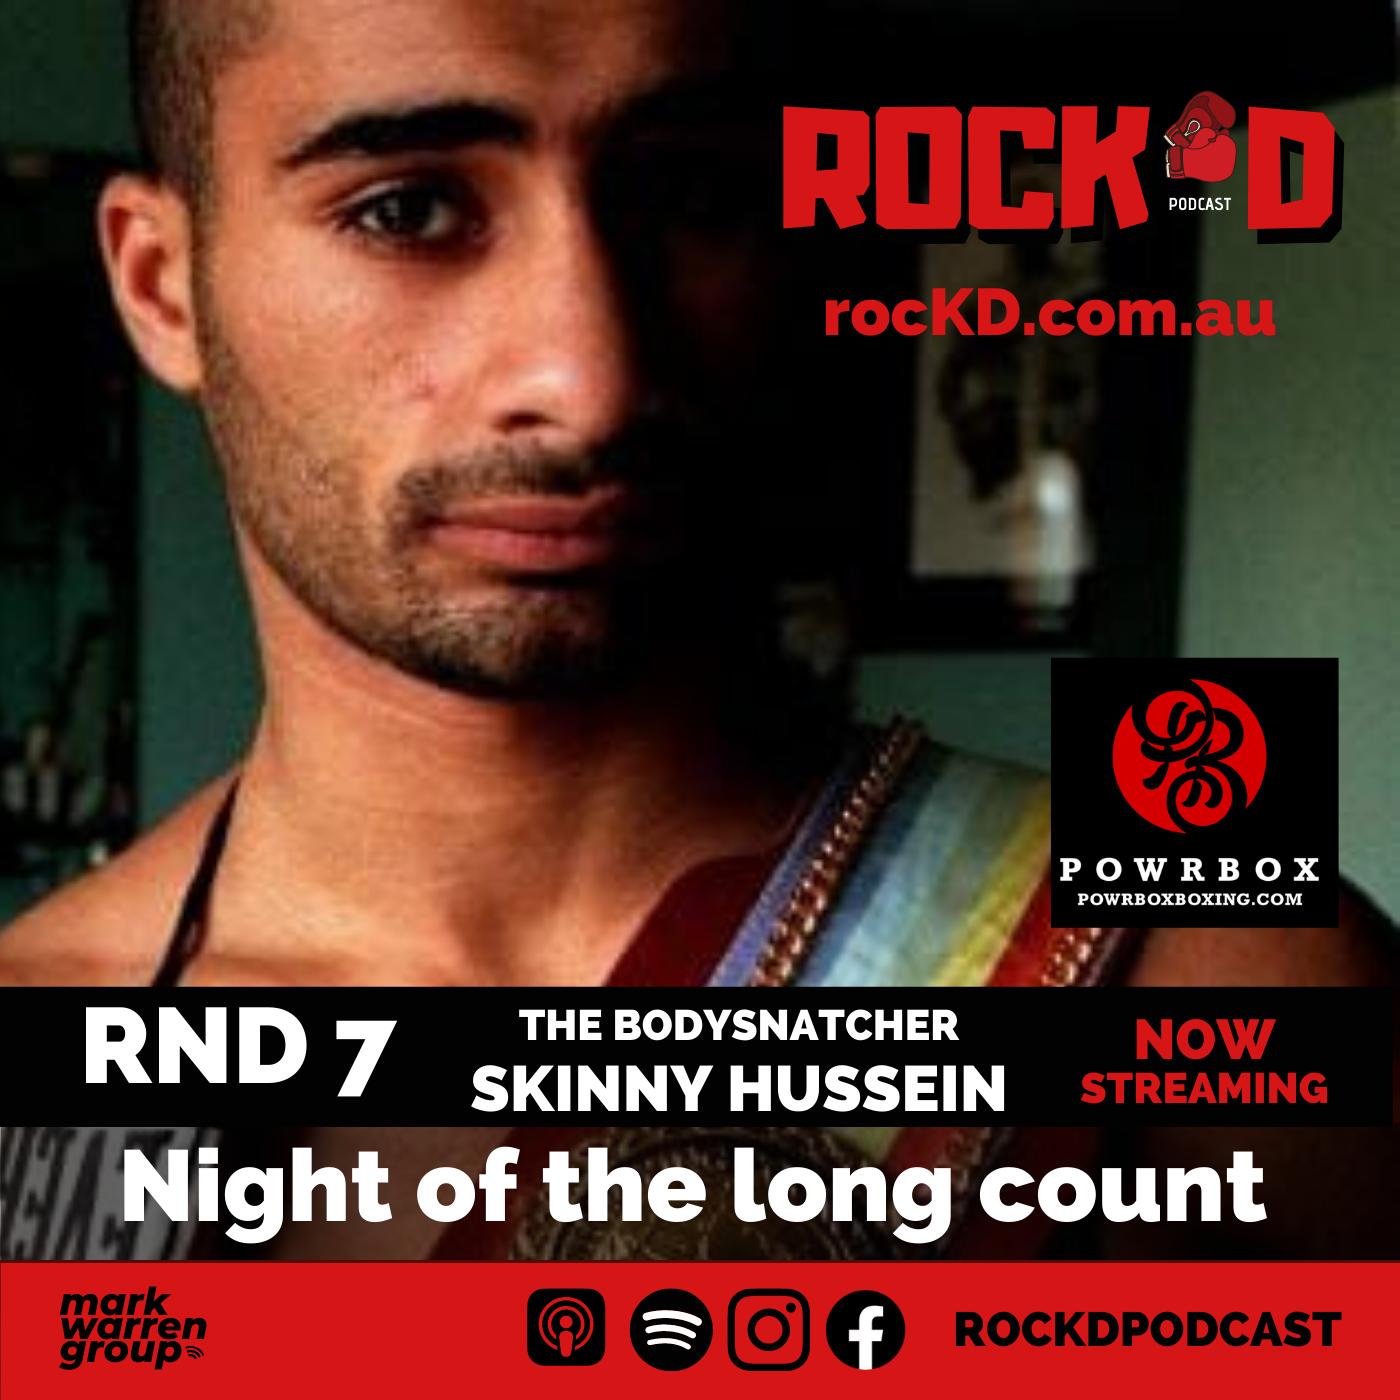 ROCKD RND7 Skinny Hussein _ NOW streaming